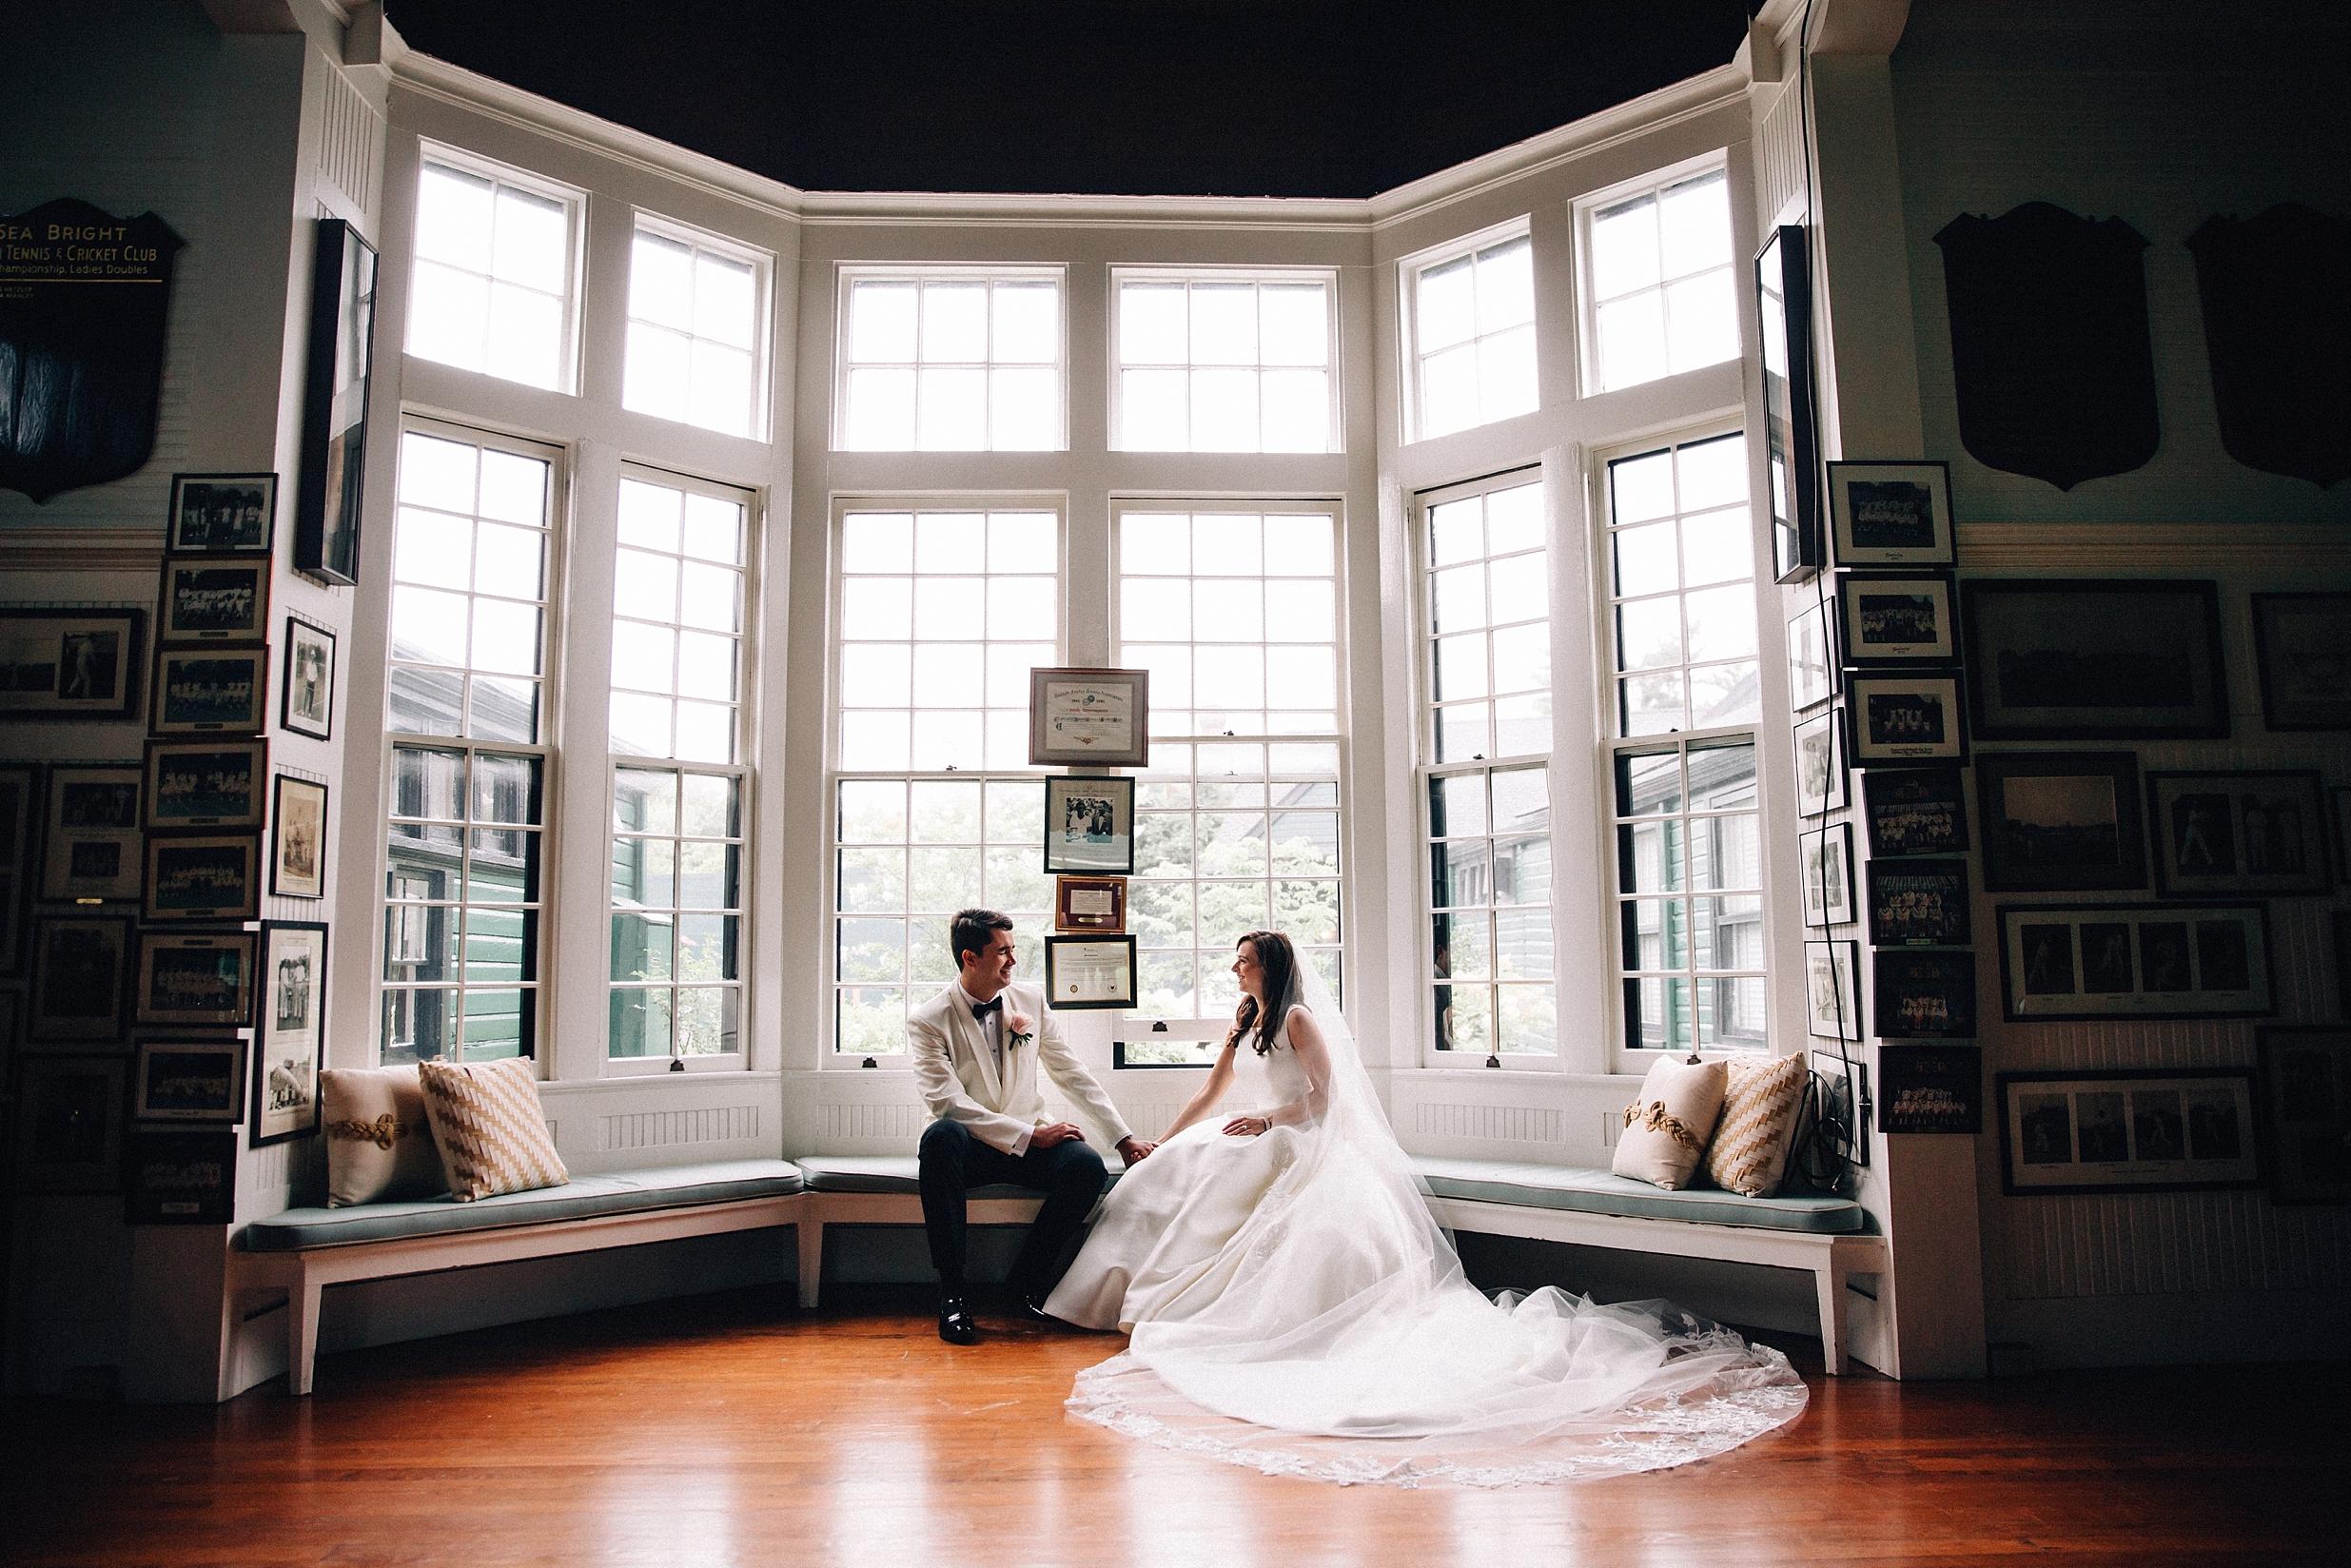 rumson-tented-wedding-nj-maine-conneticut-classic_0026.jpg